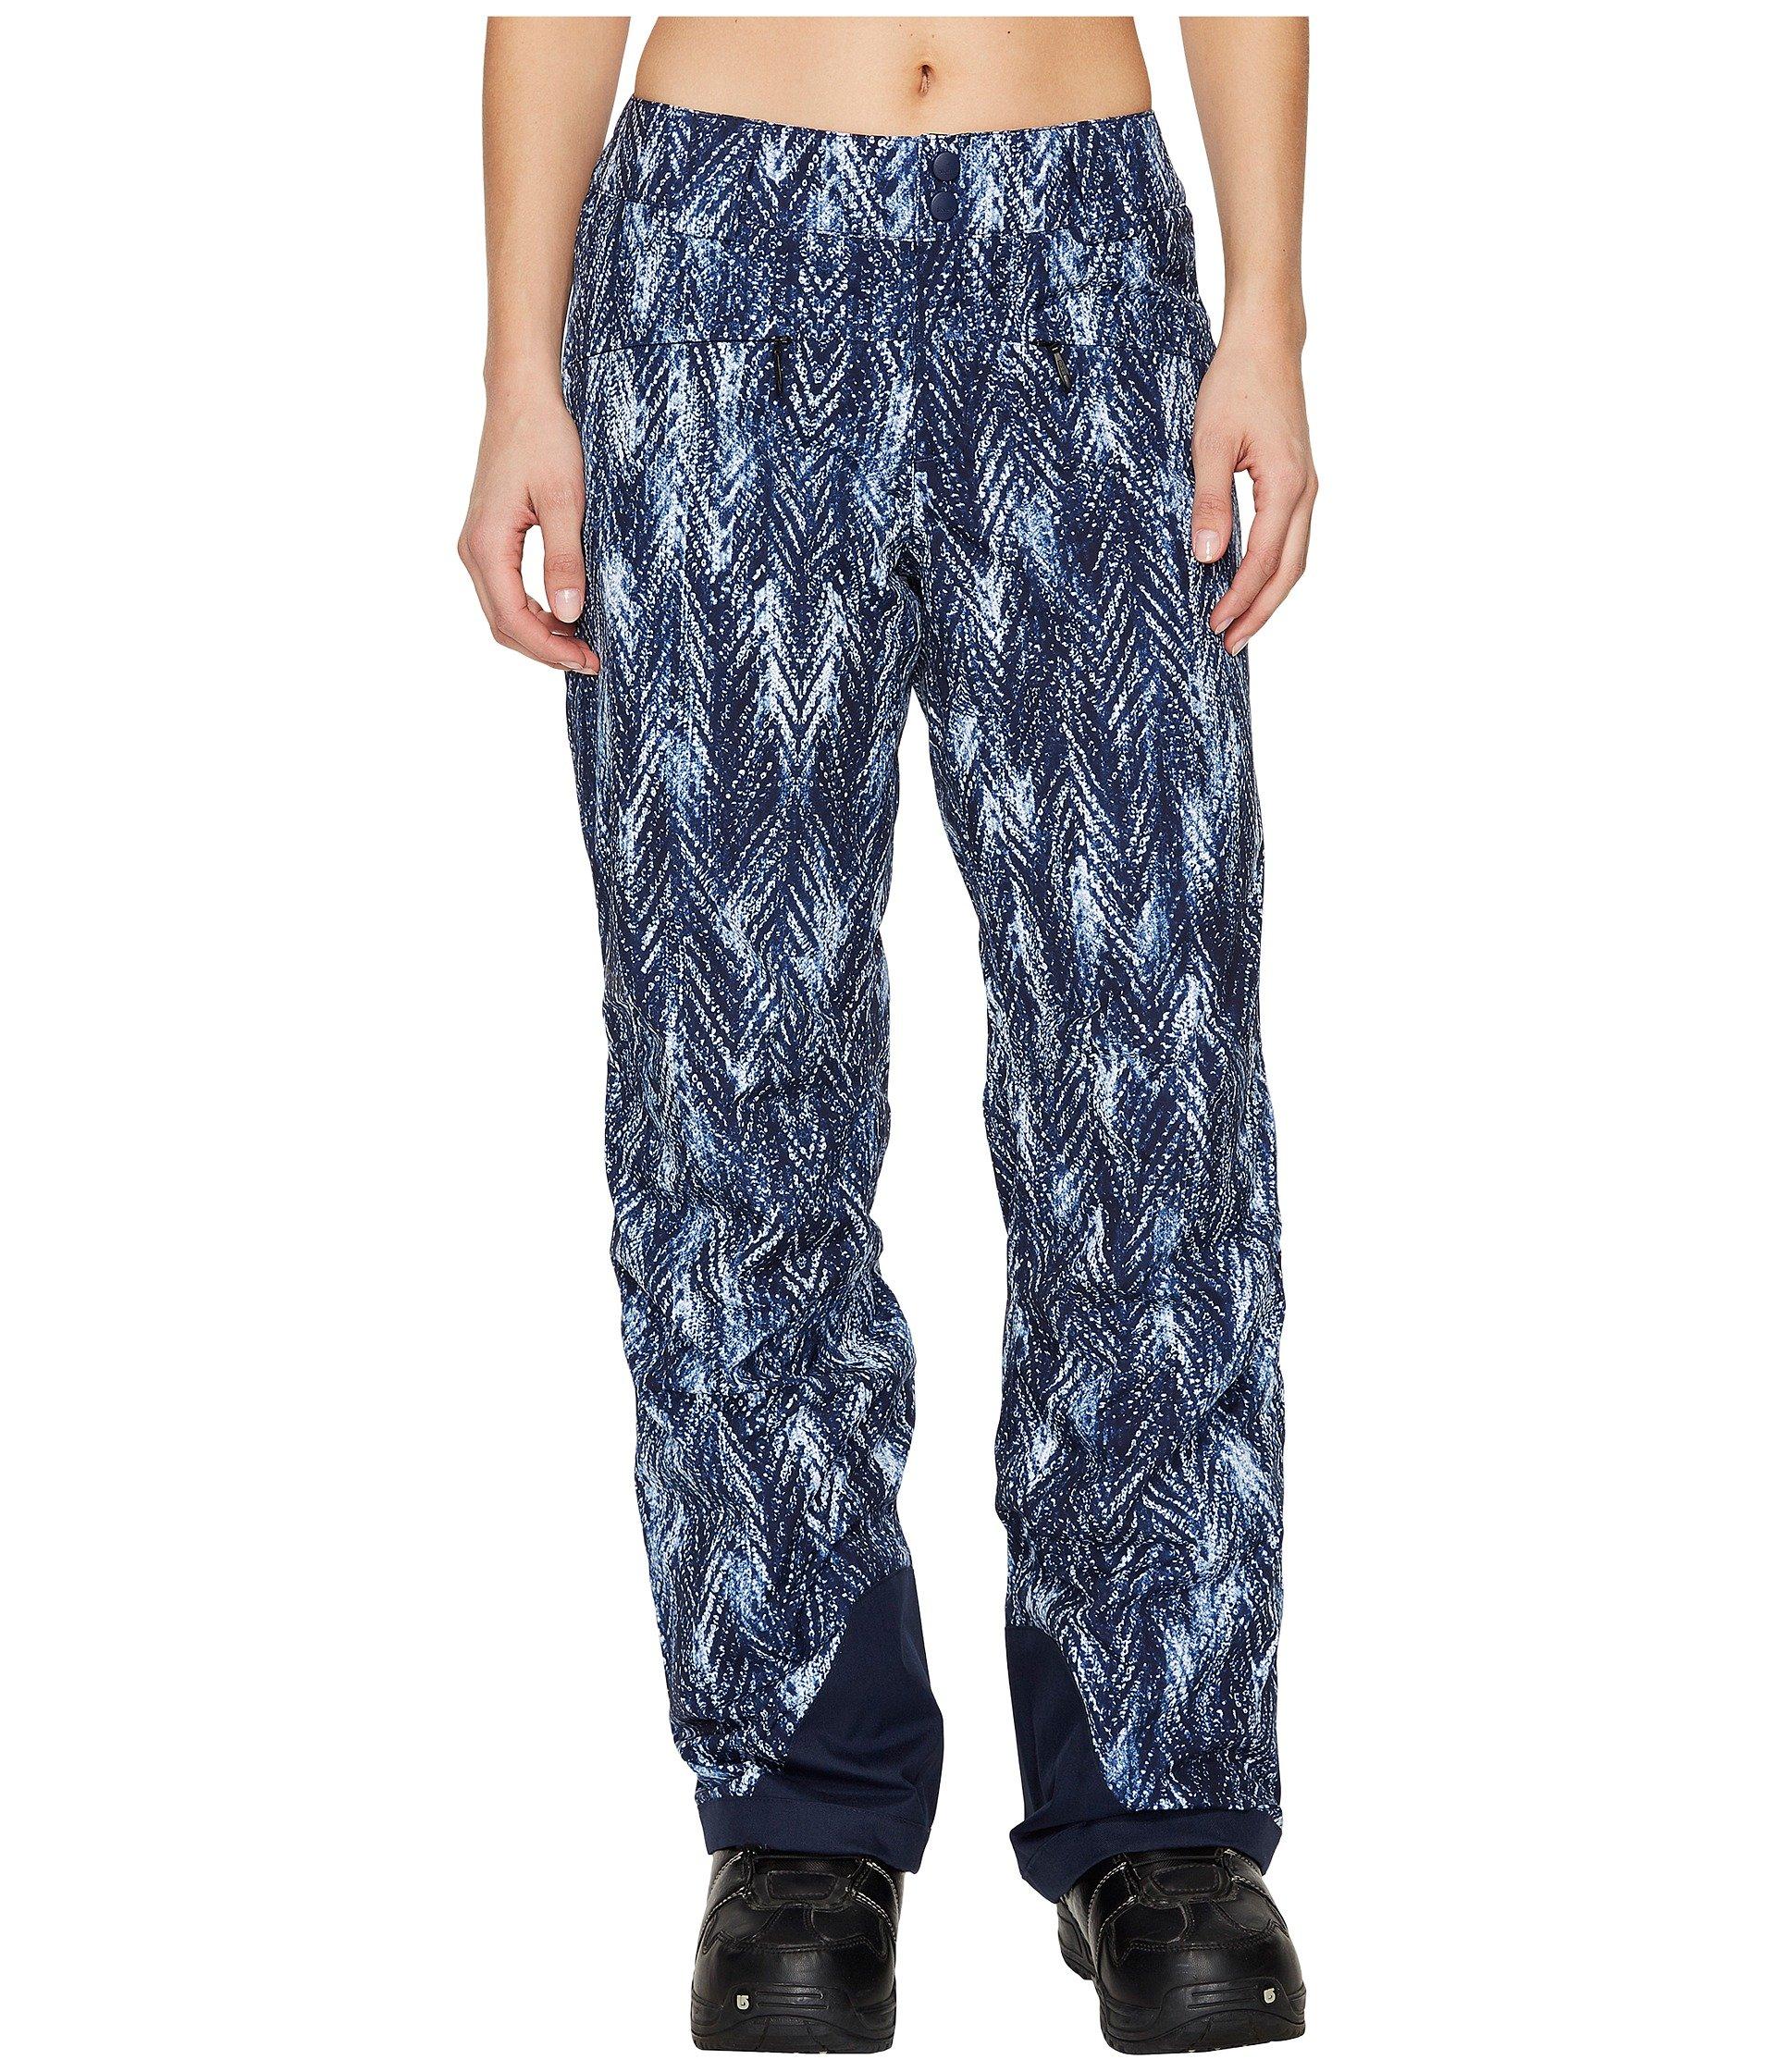 Montebello Pants